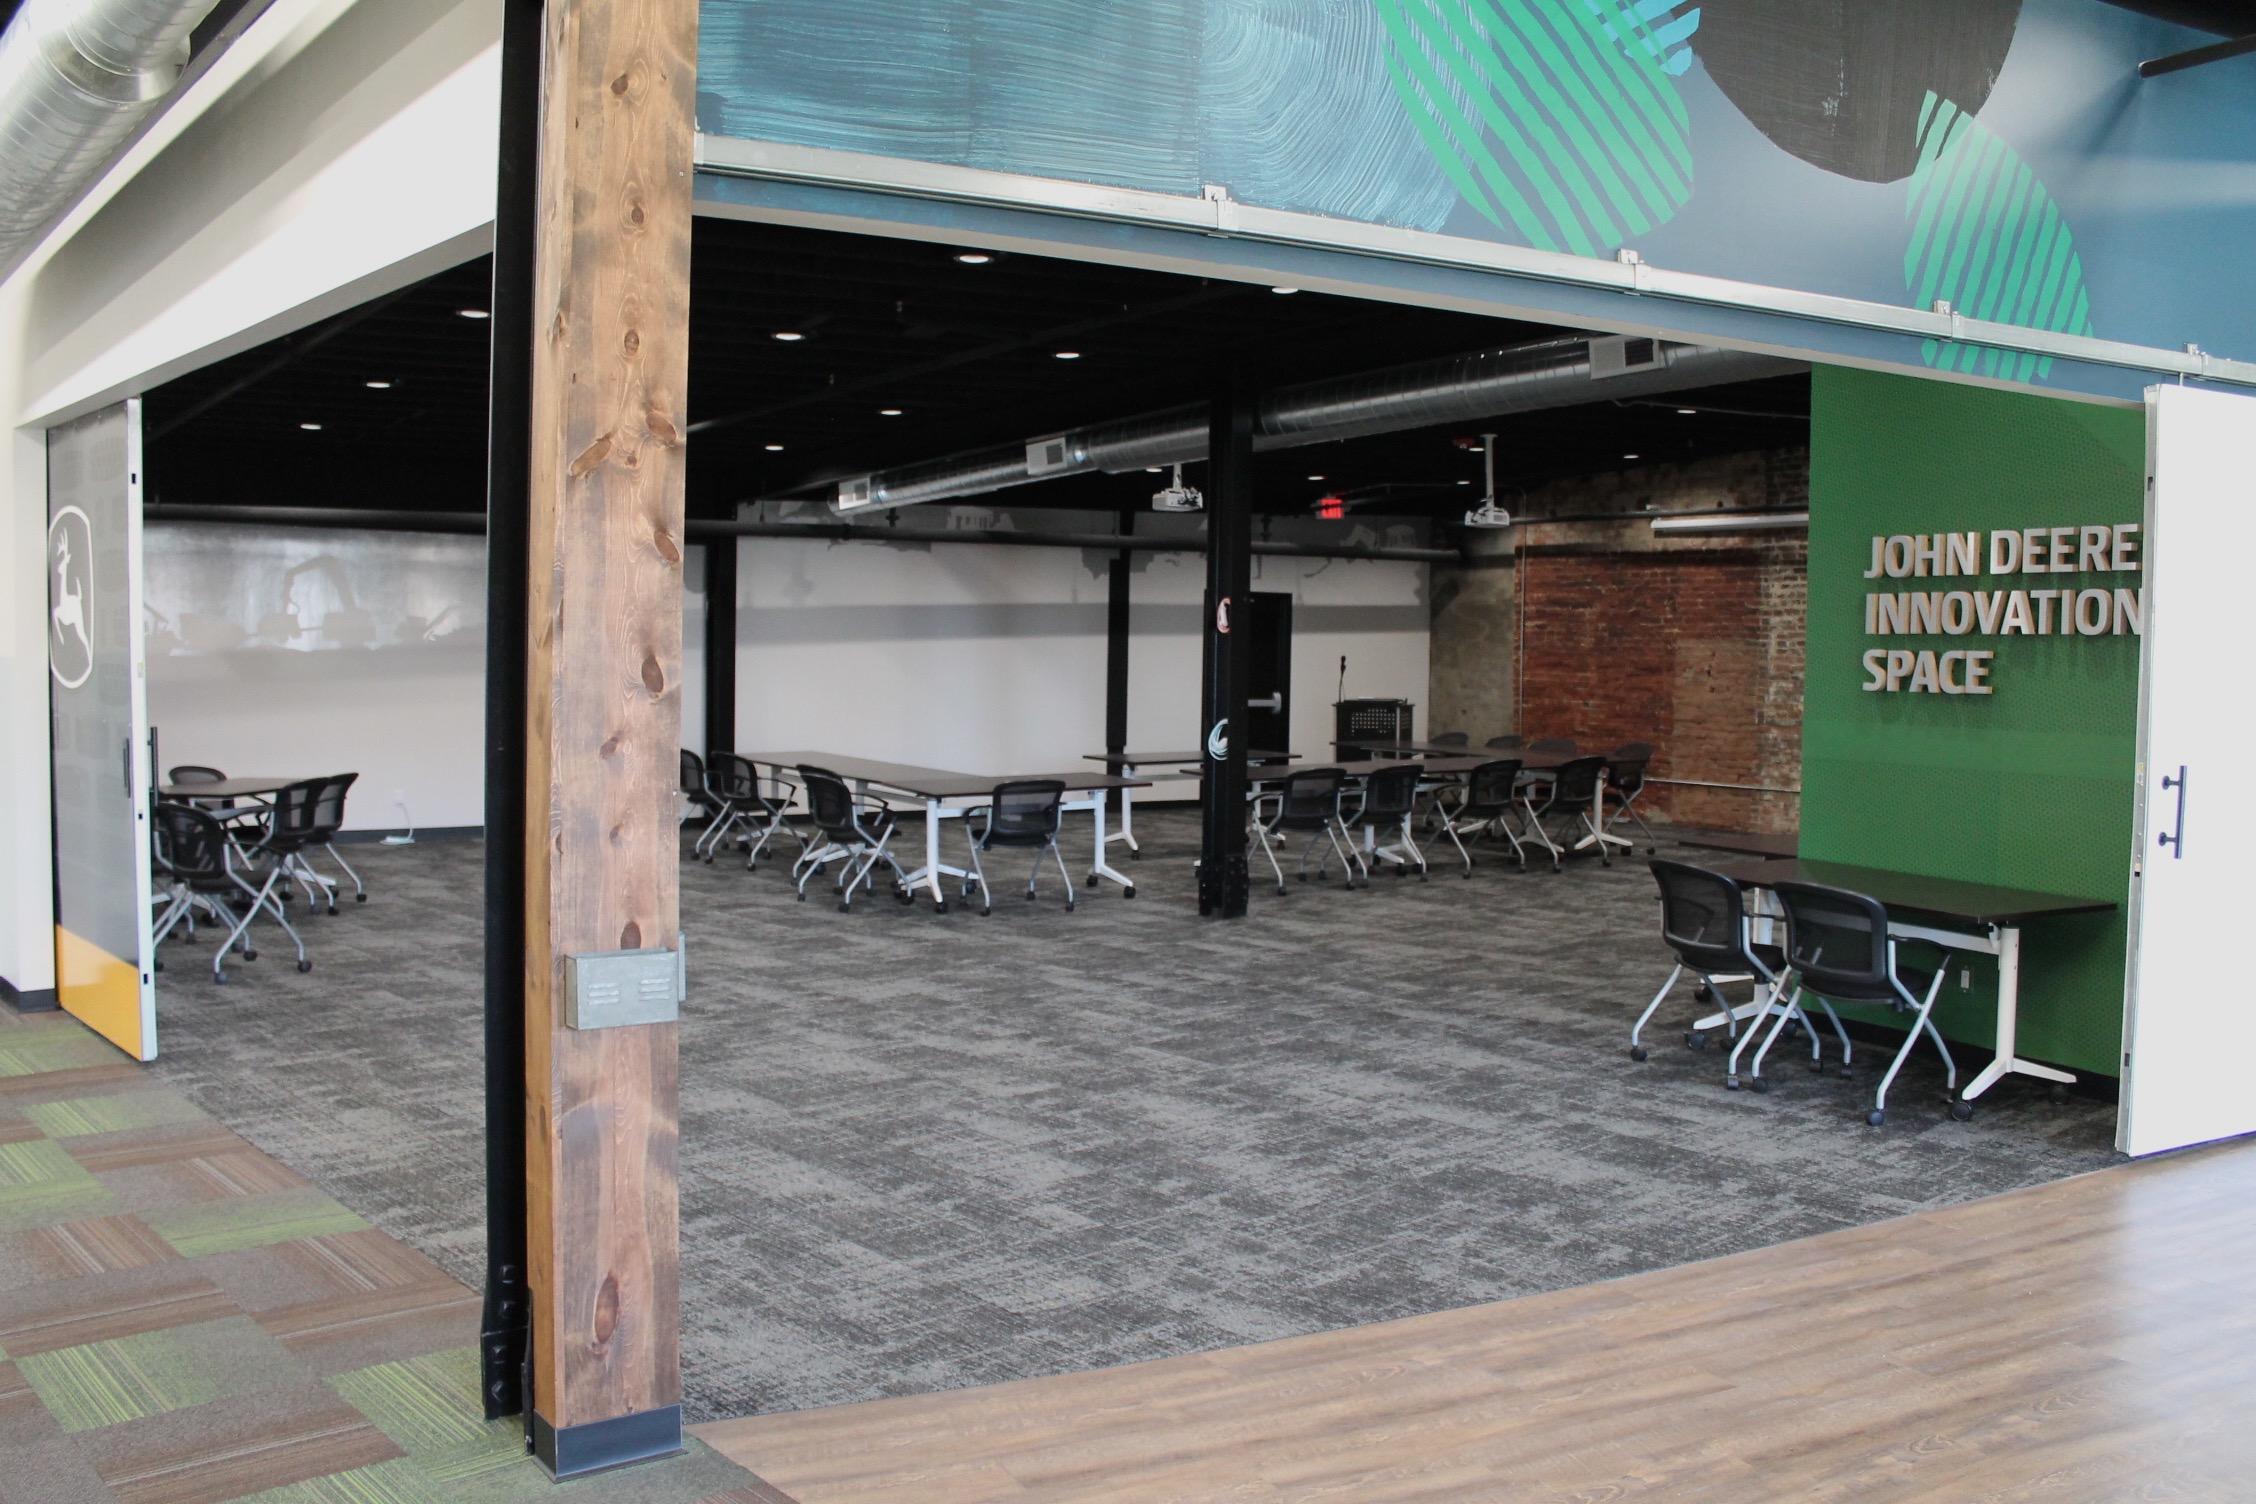 Innovation Lab - JDIR, JDIS empty room, better photo.JPG